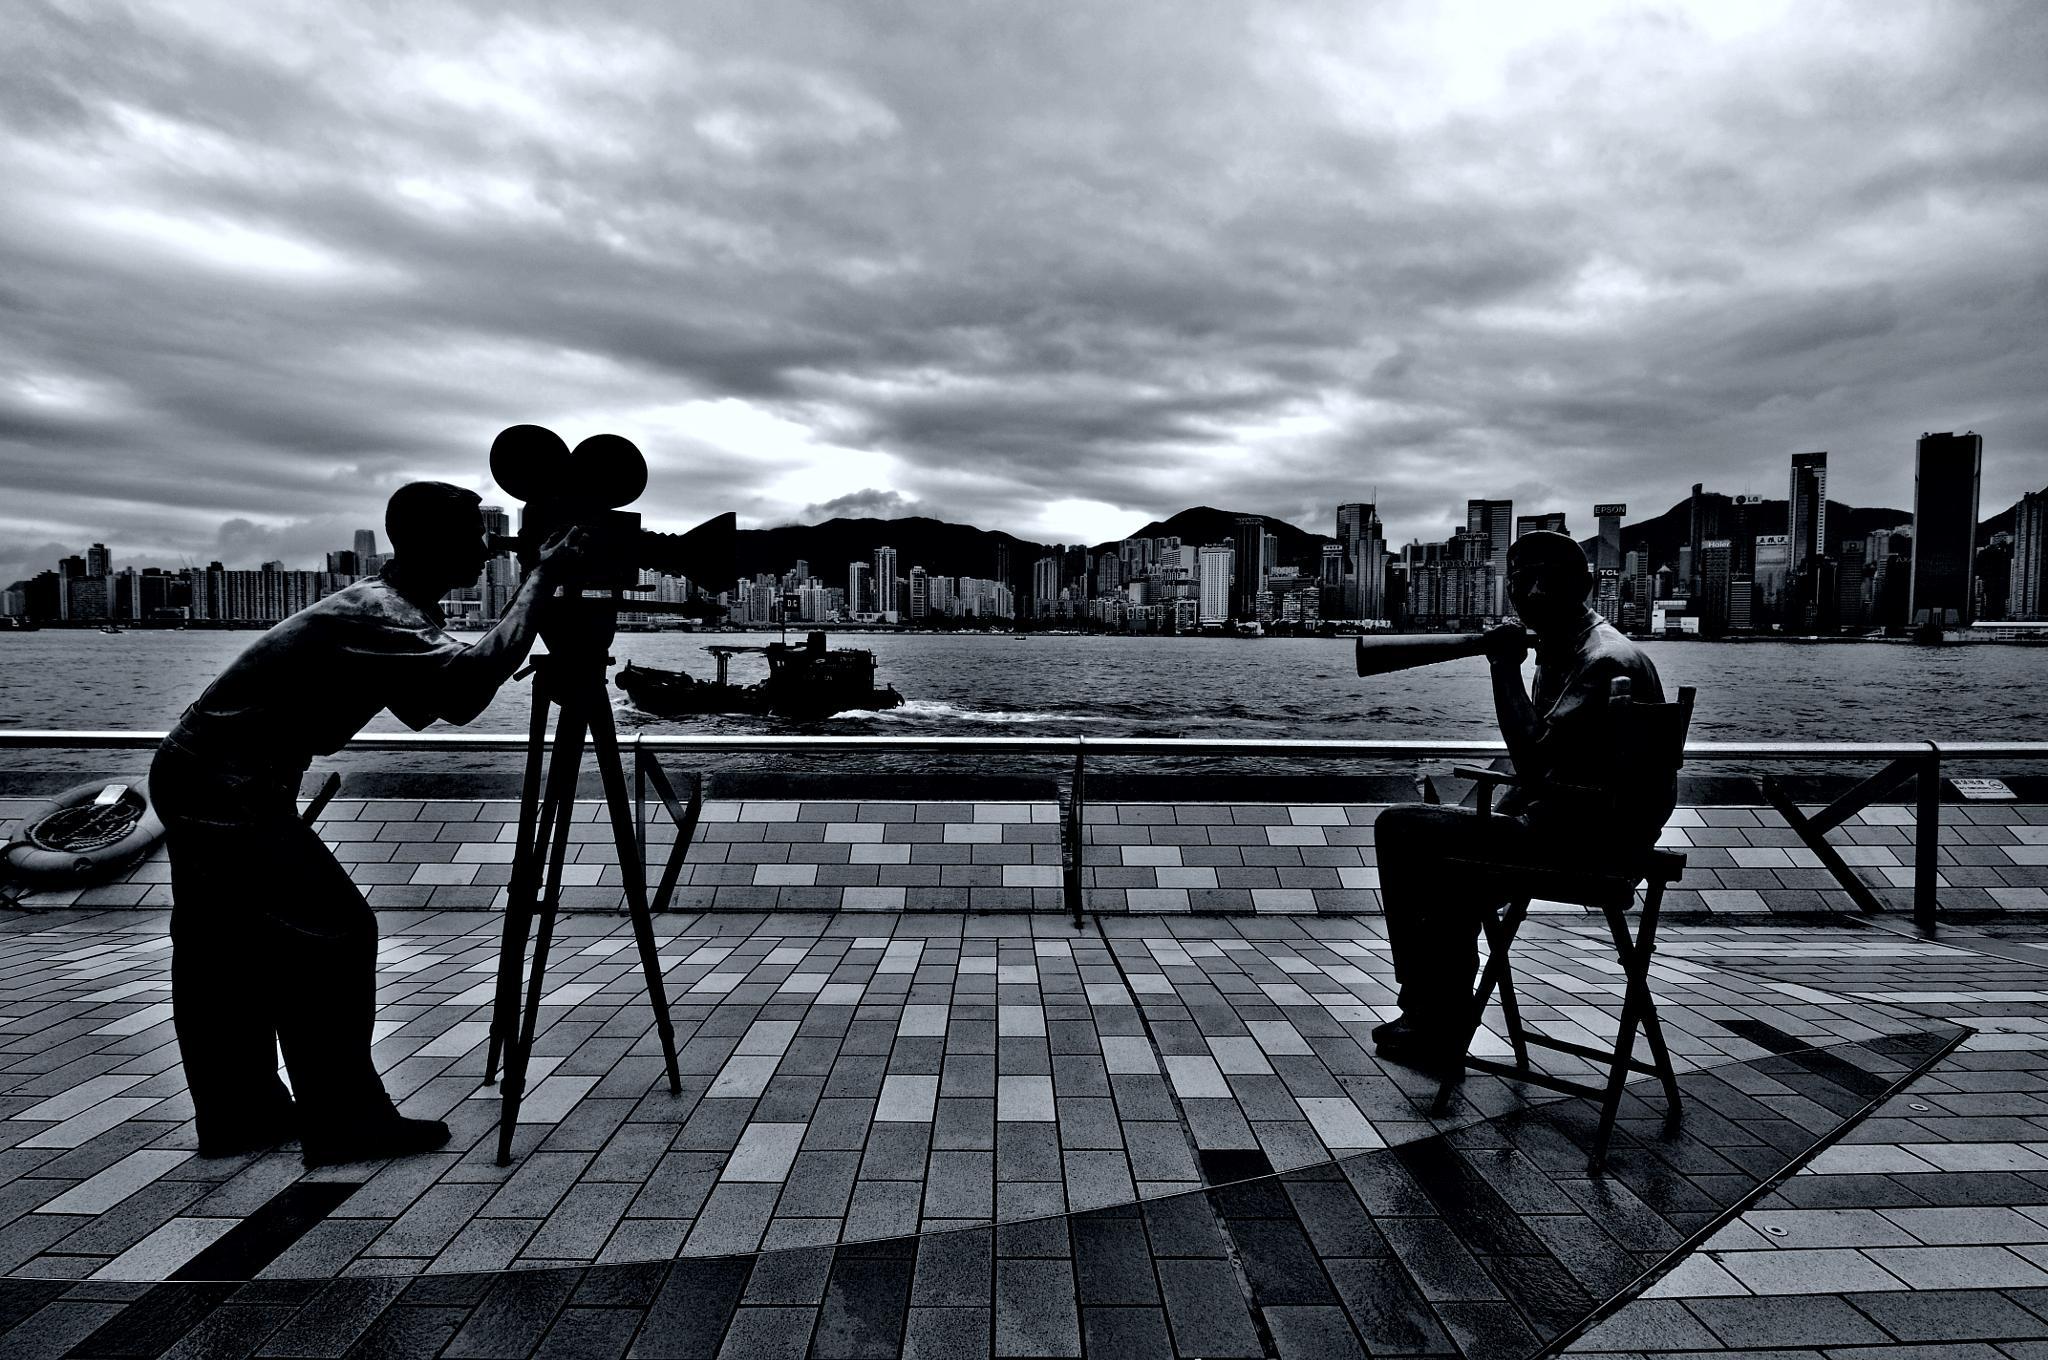 Filming by David Lam